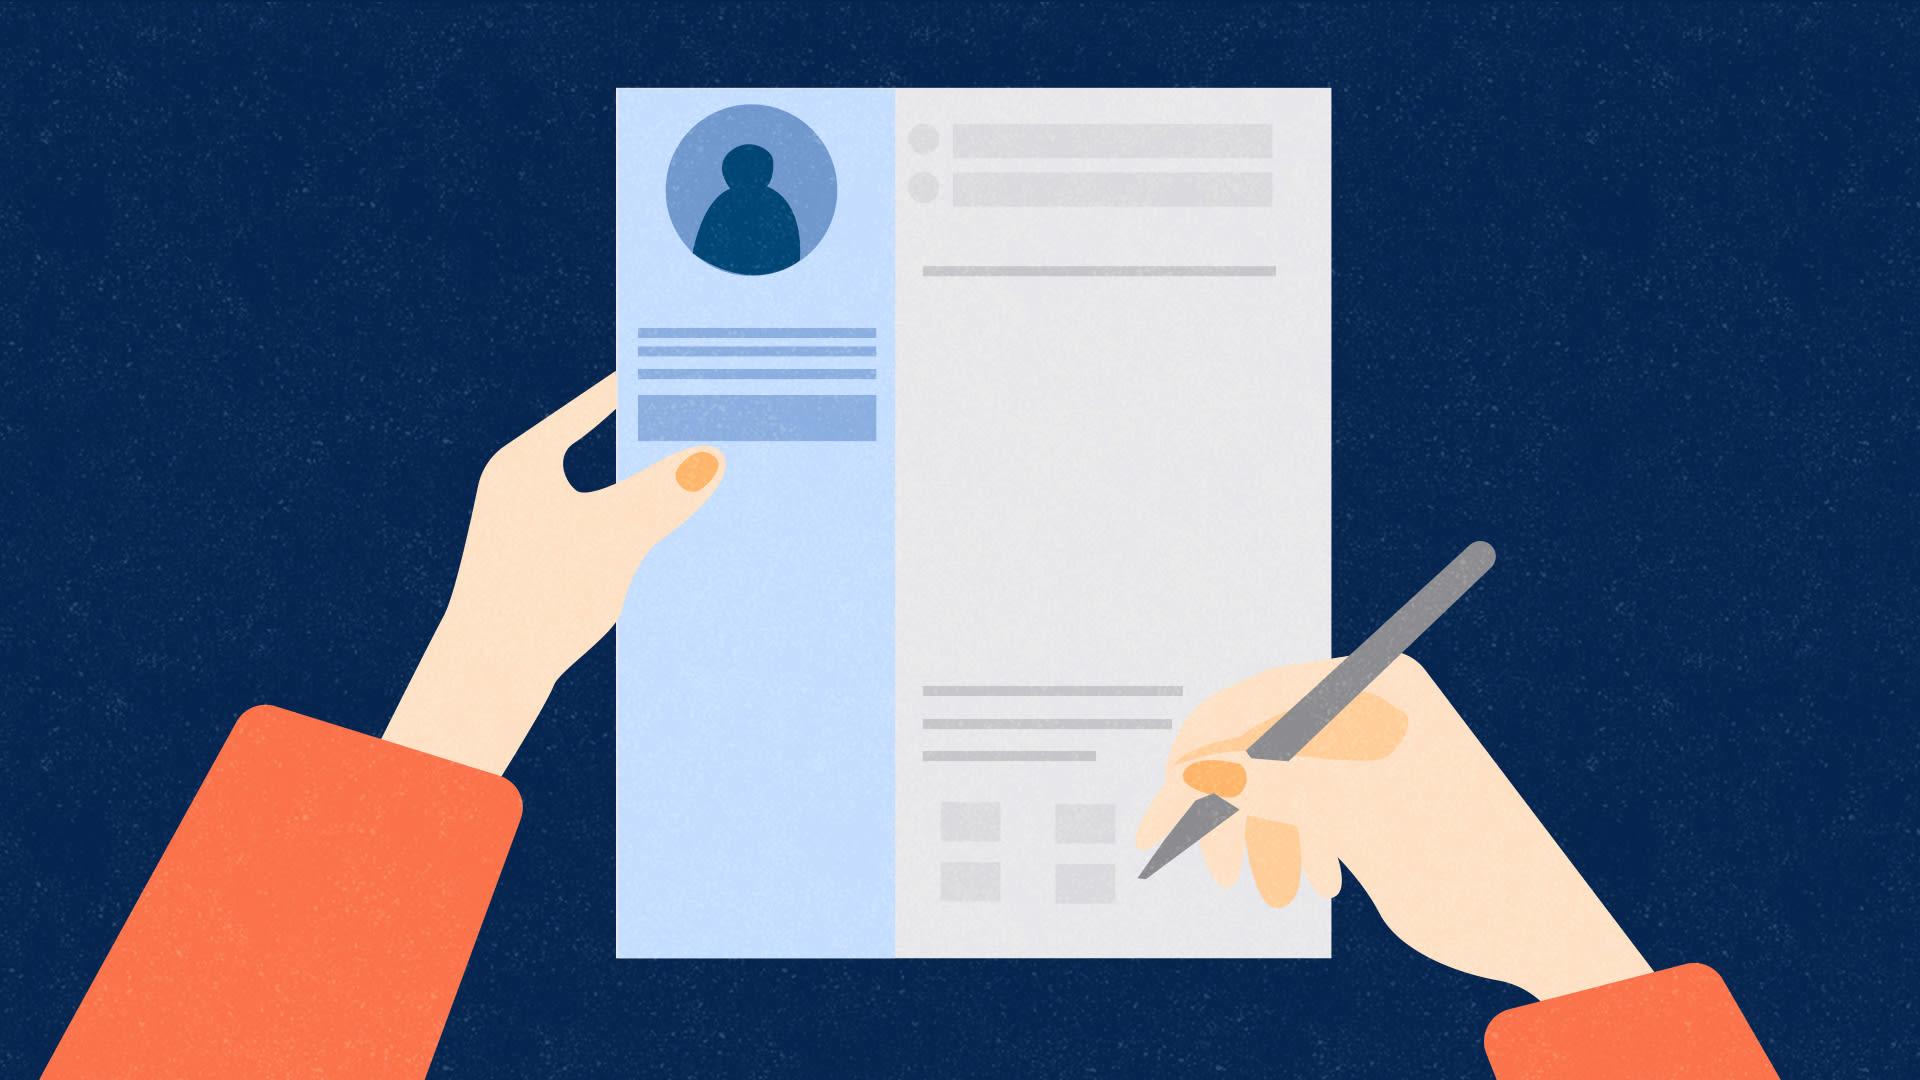 resume-tips-lying